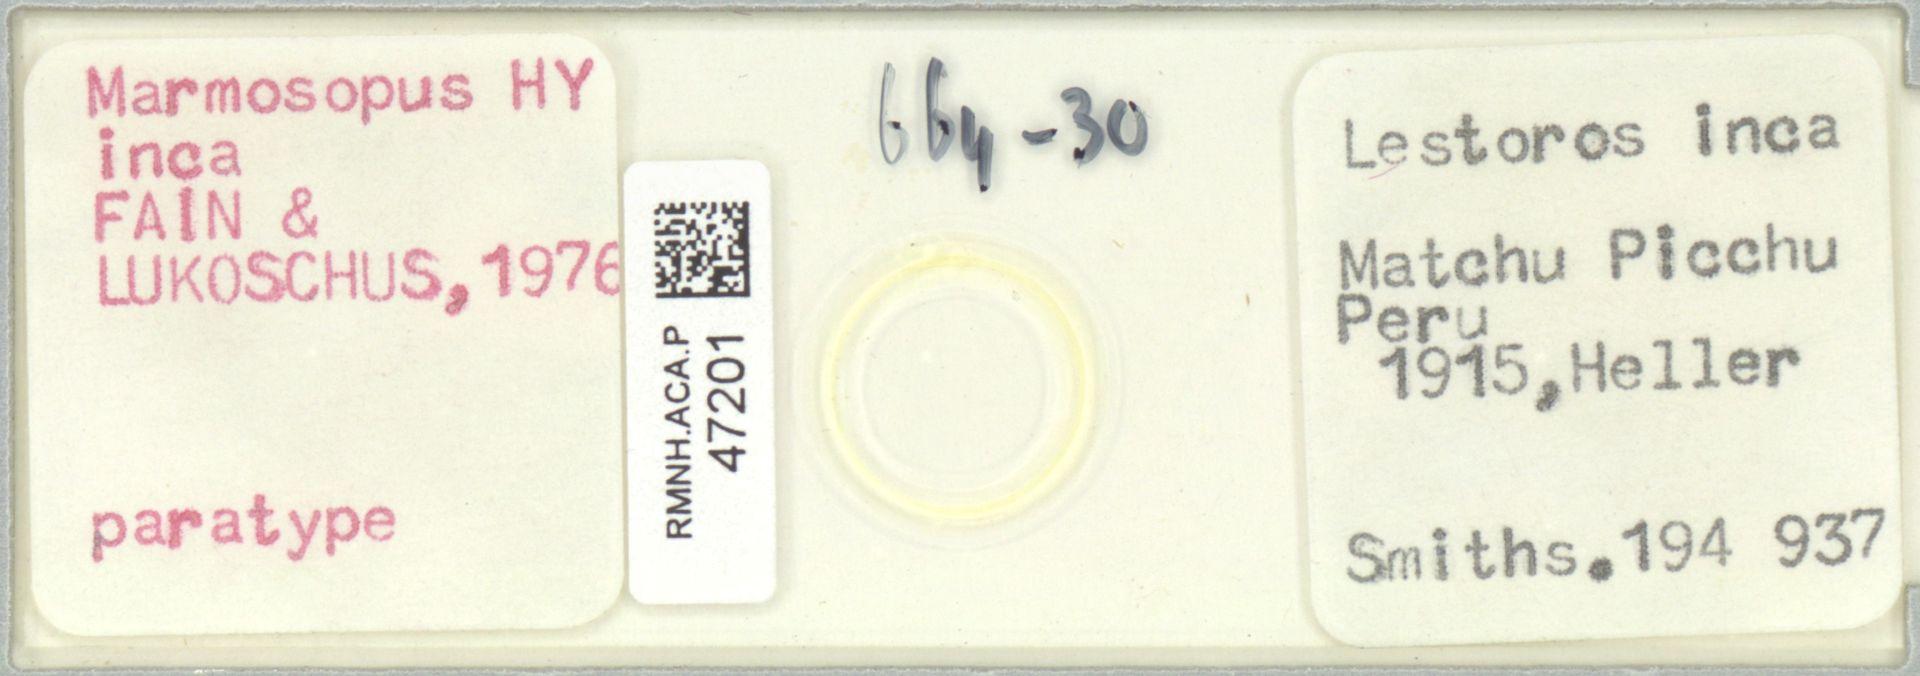 RMNH.ACA.P.47201 | Marmosopus inca FAIN & LUKOSCHUS, 1976